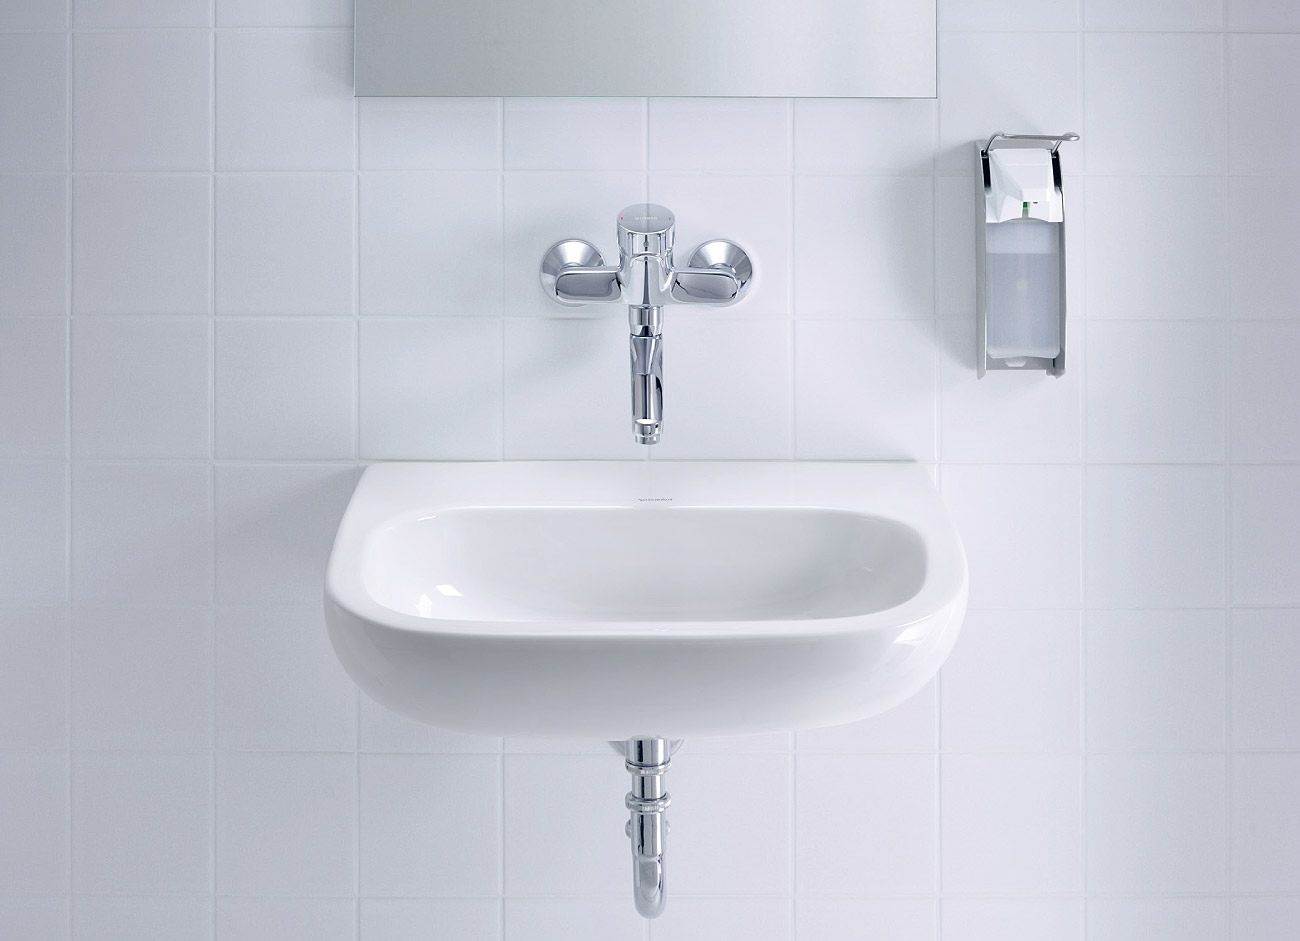 Bagni handicap finest wc per bagno di ospedale bagno per ospedale